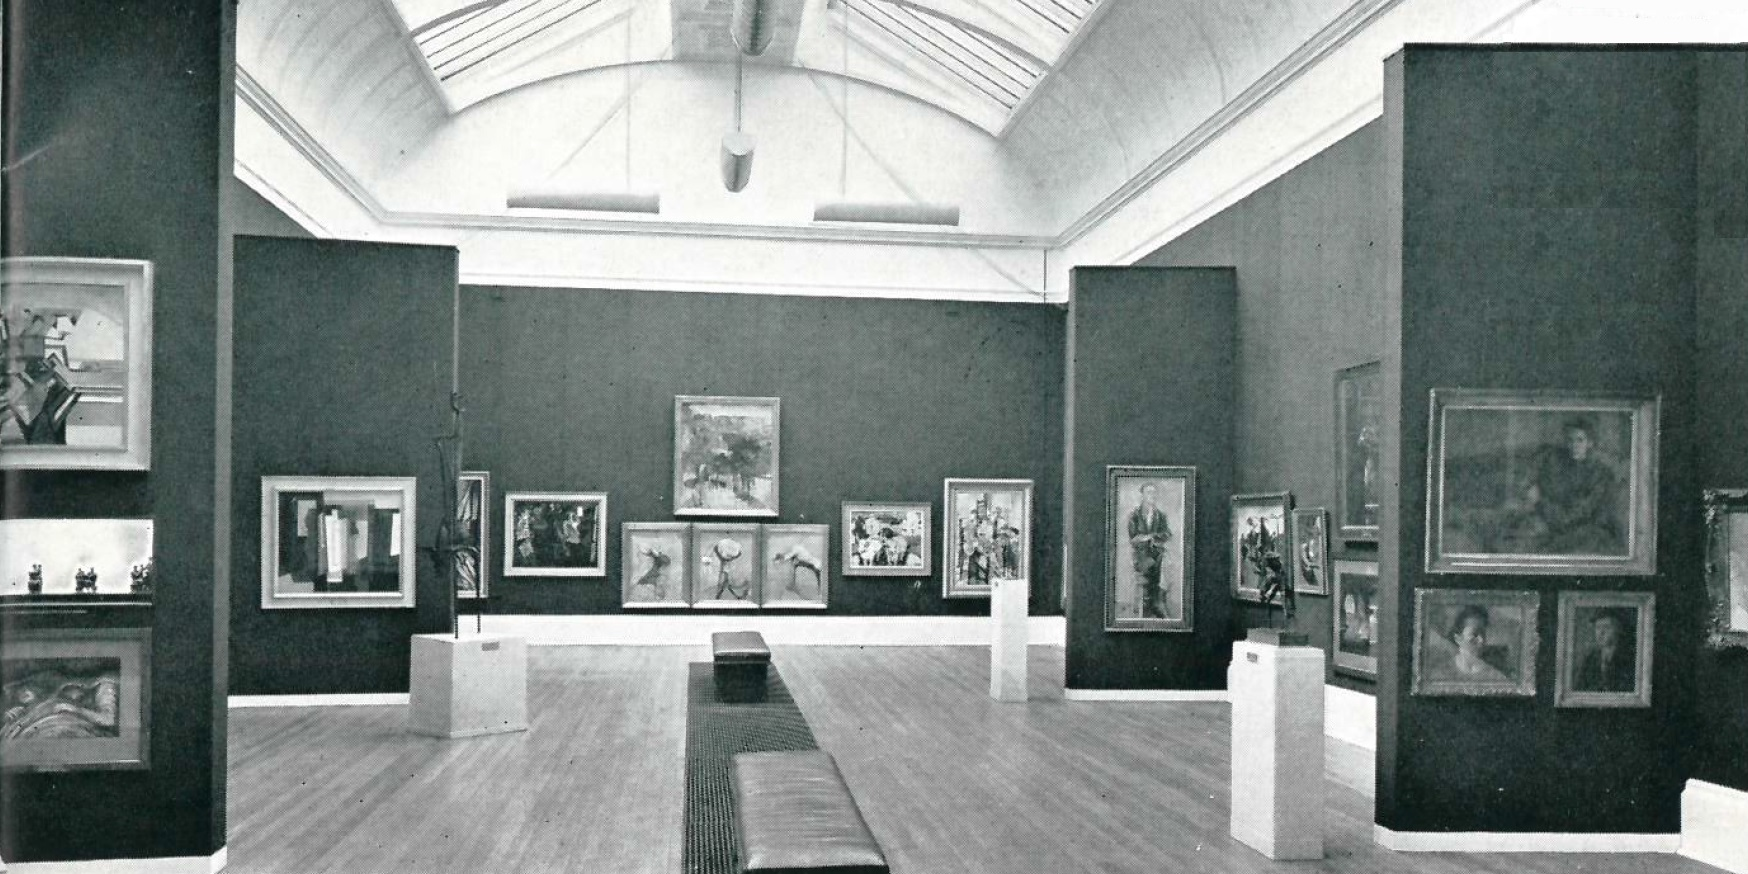 The 1957 Rehang Of Tates Modern British Gallery Displaying The